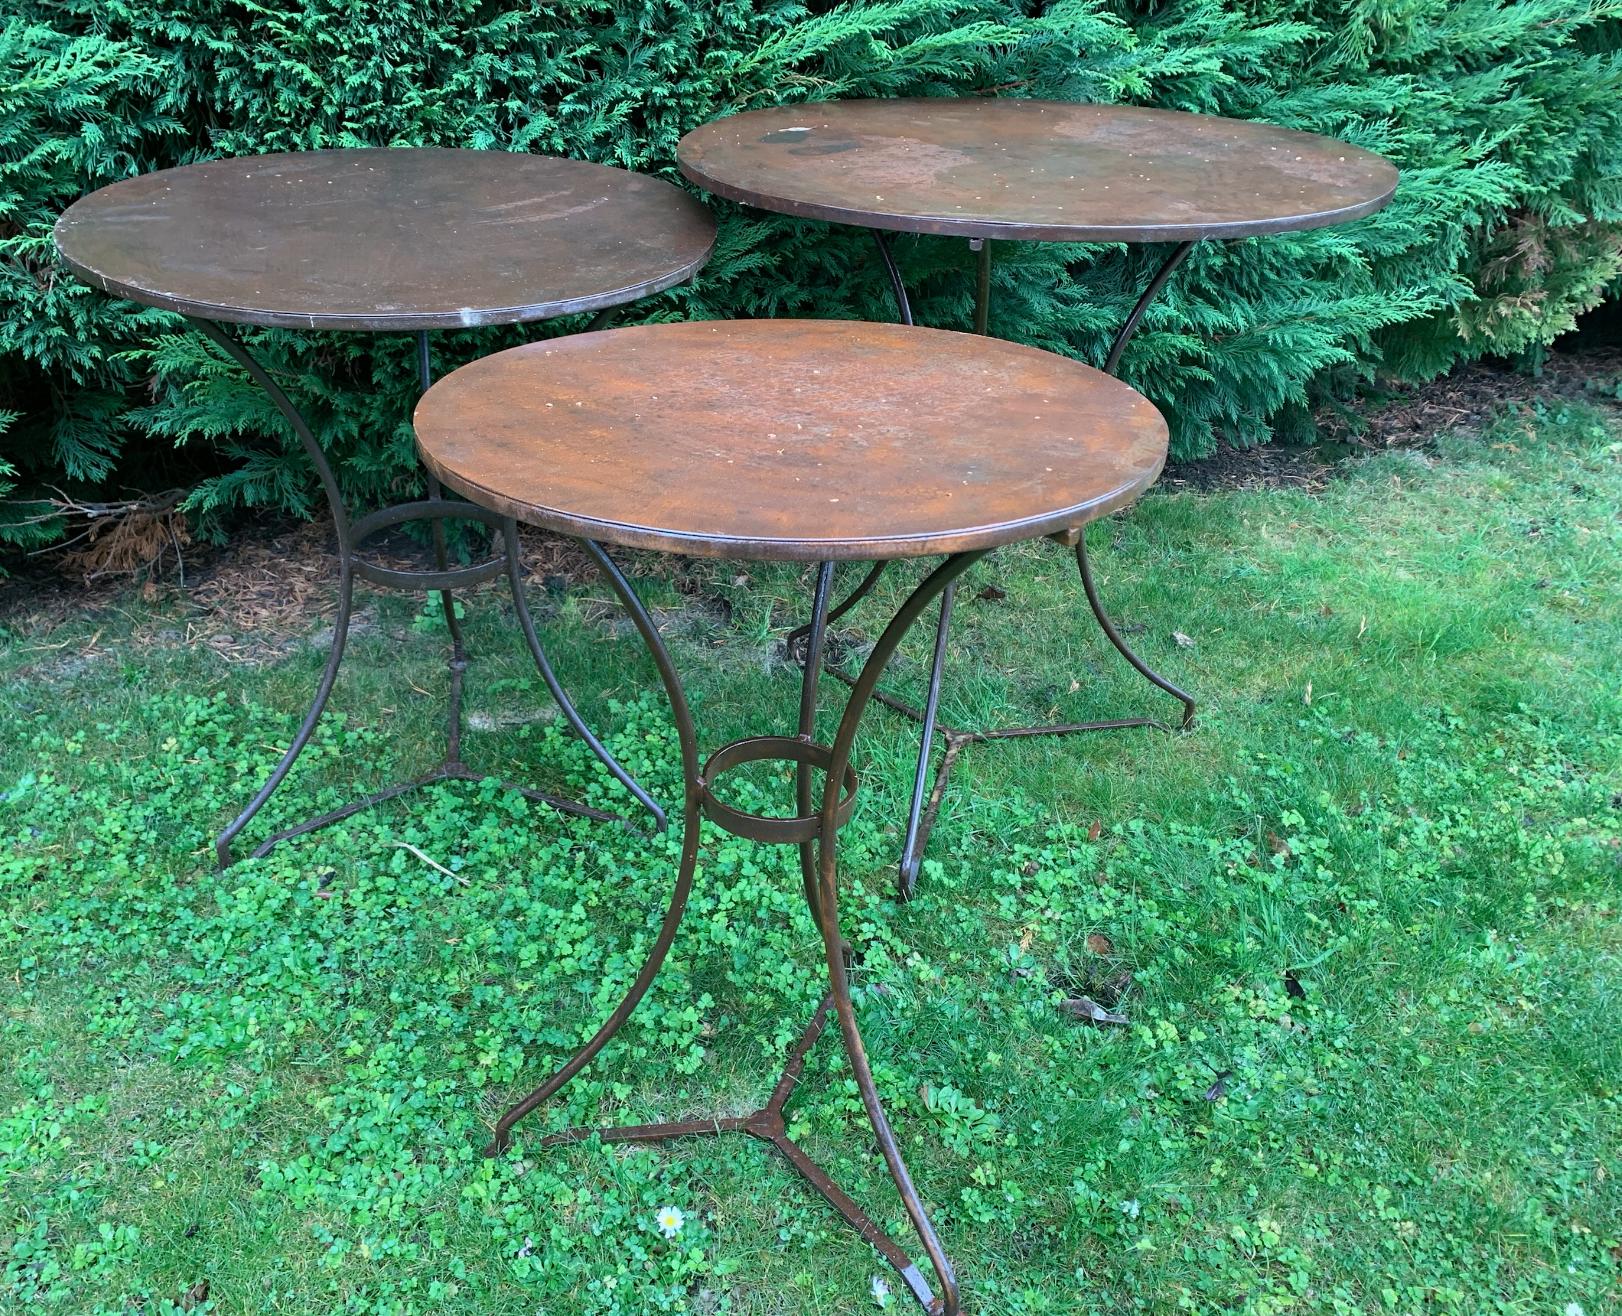 Contemporary French iron bistro tables TC955 50cm  $165  TC956 60cm  $185  TC952a 70cm  $245